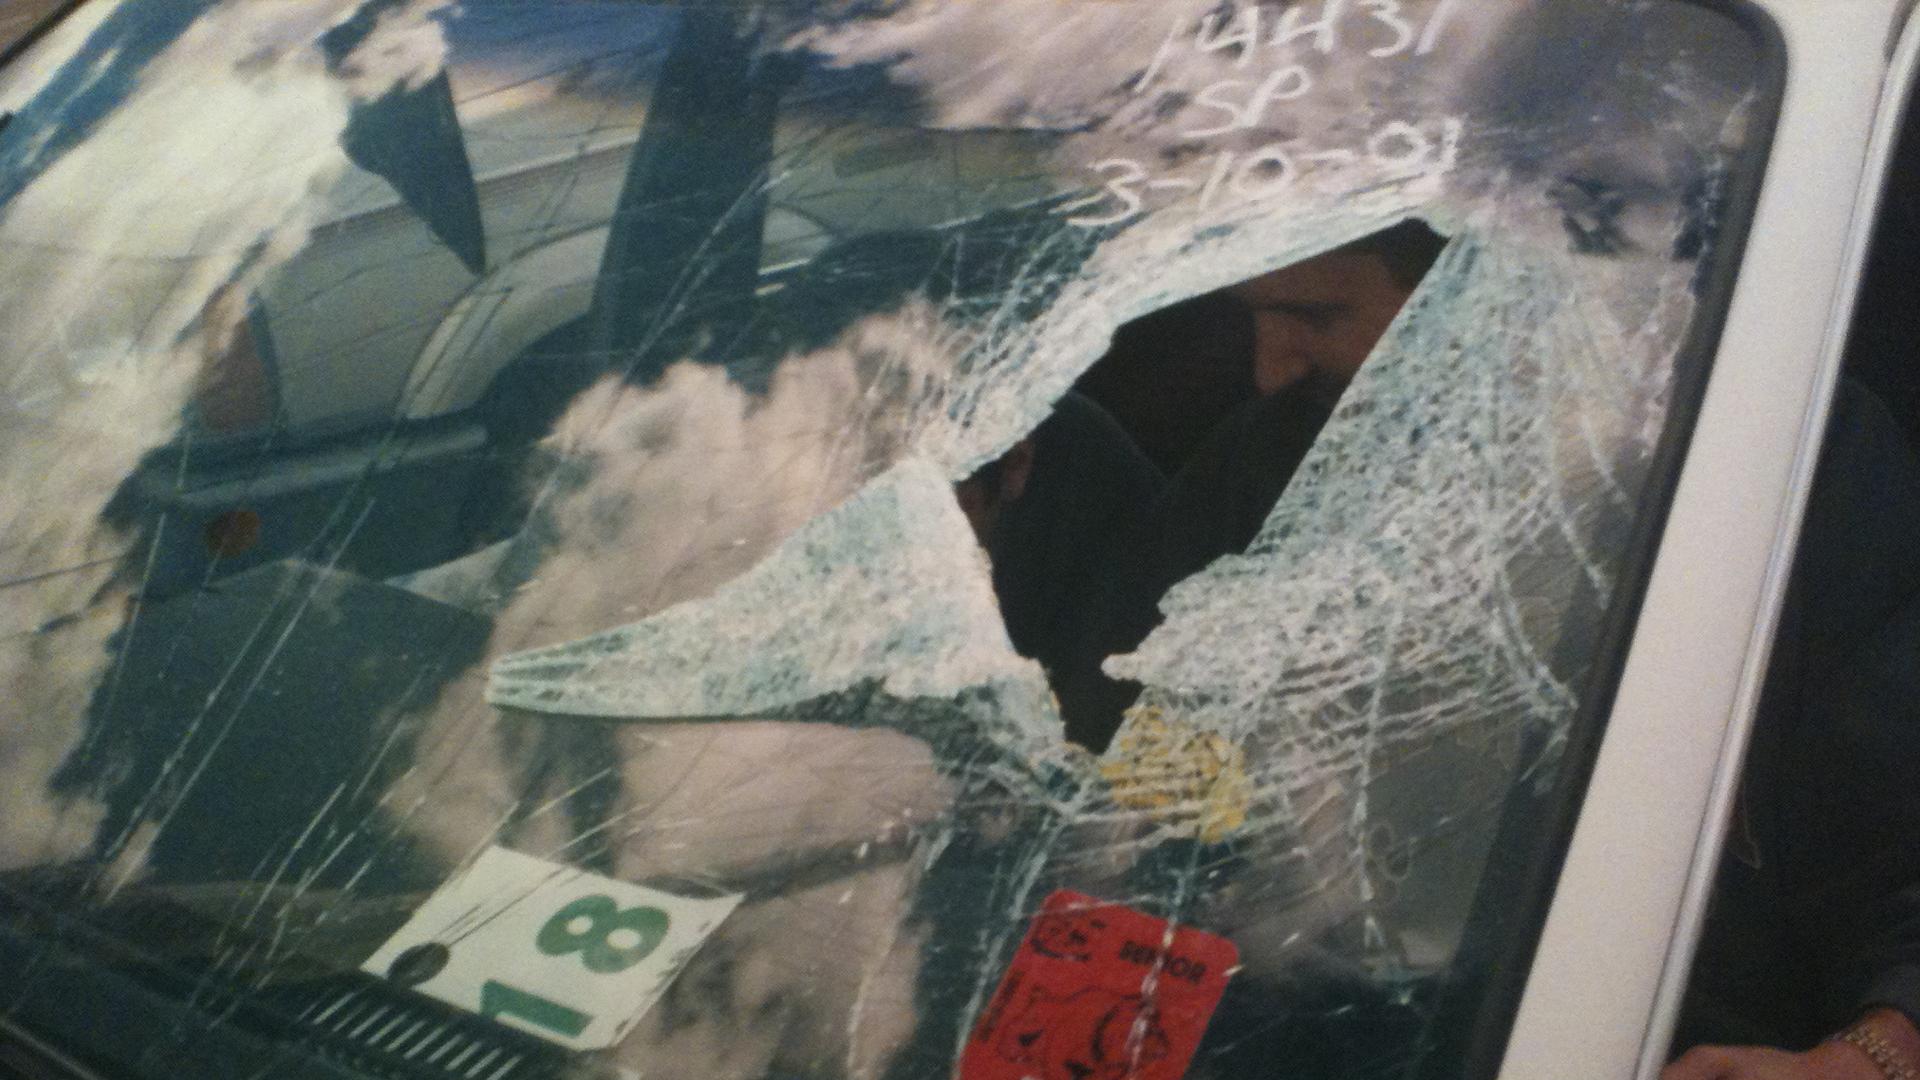 accident_car3.jpg